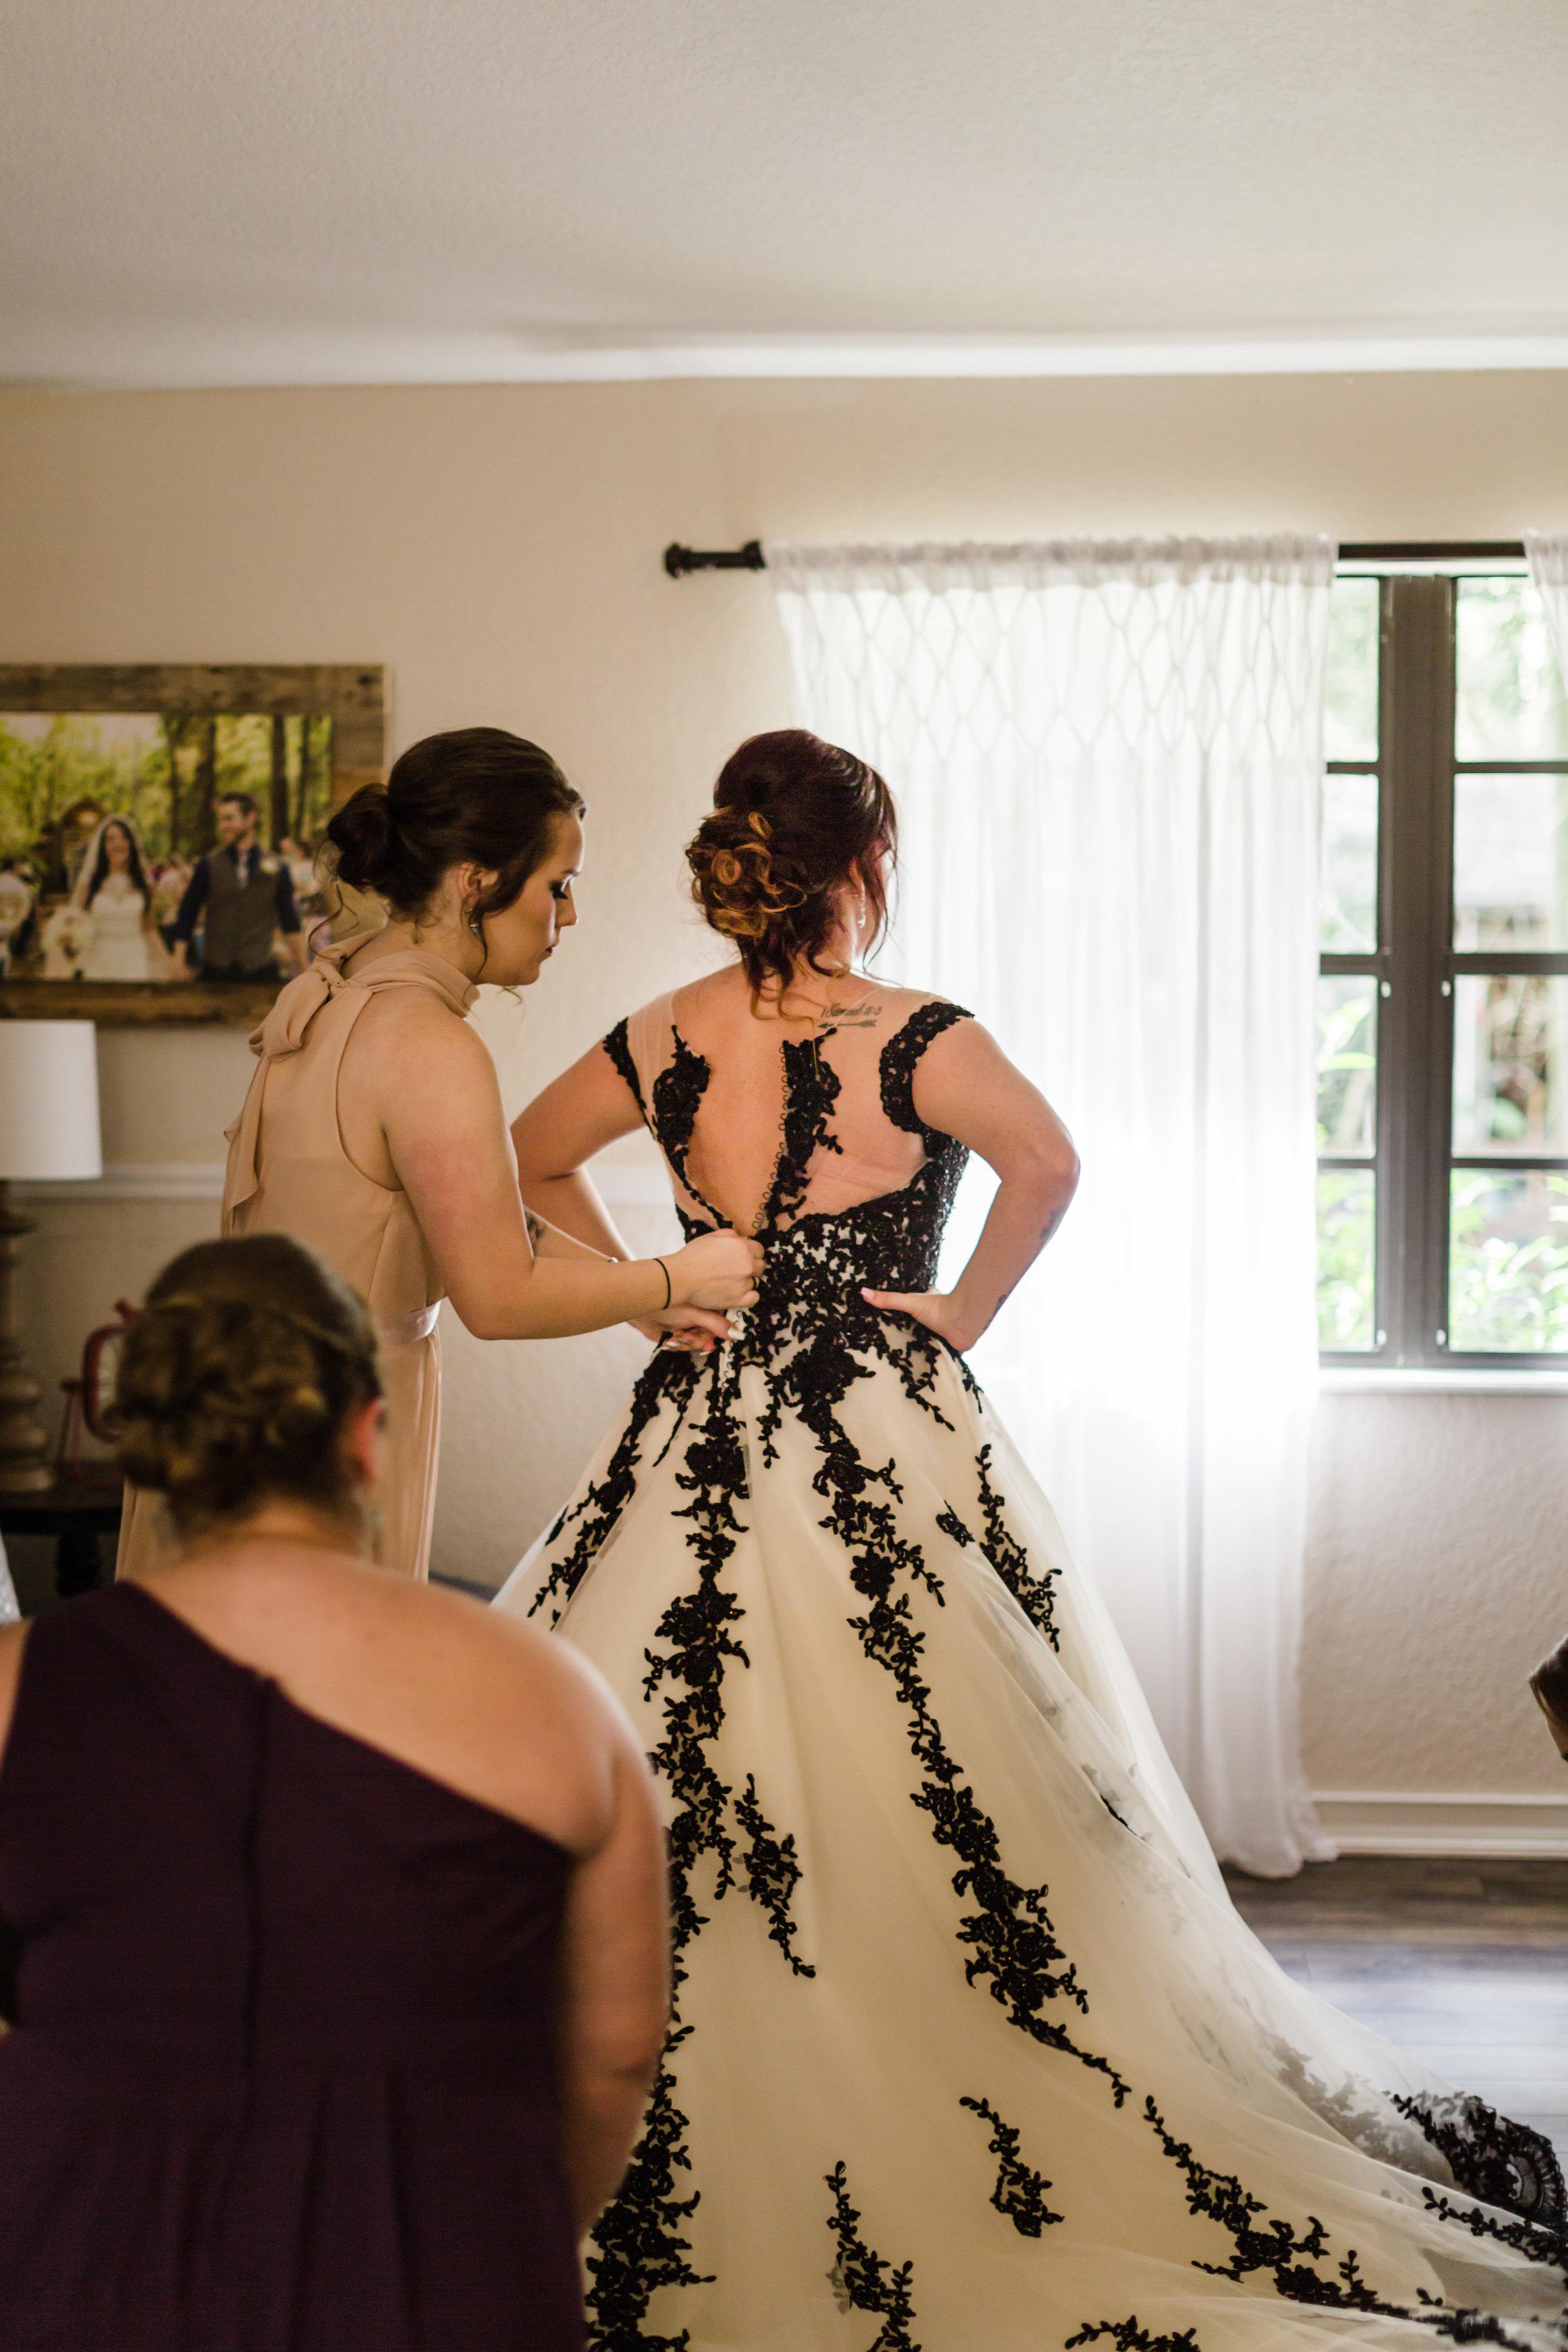 2019.01.12 Ashley and Nathan Bridle Oaks Wedding (36 of 1091).jpg